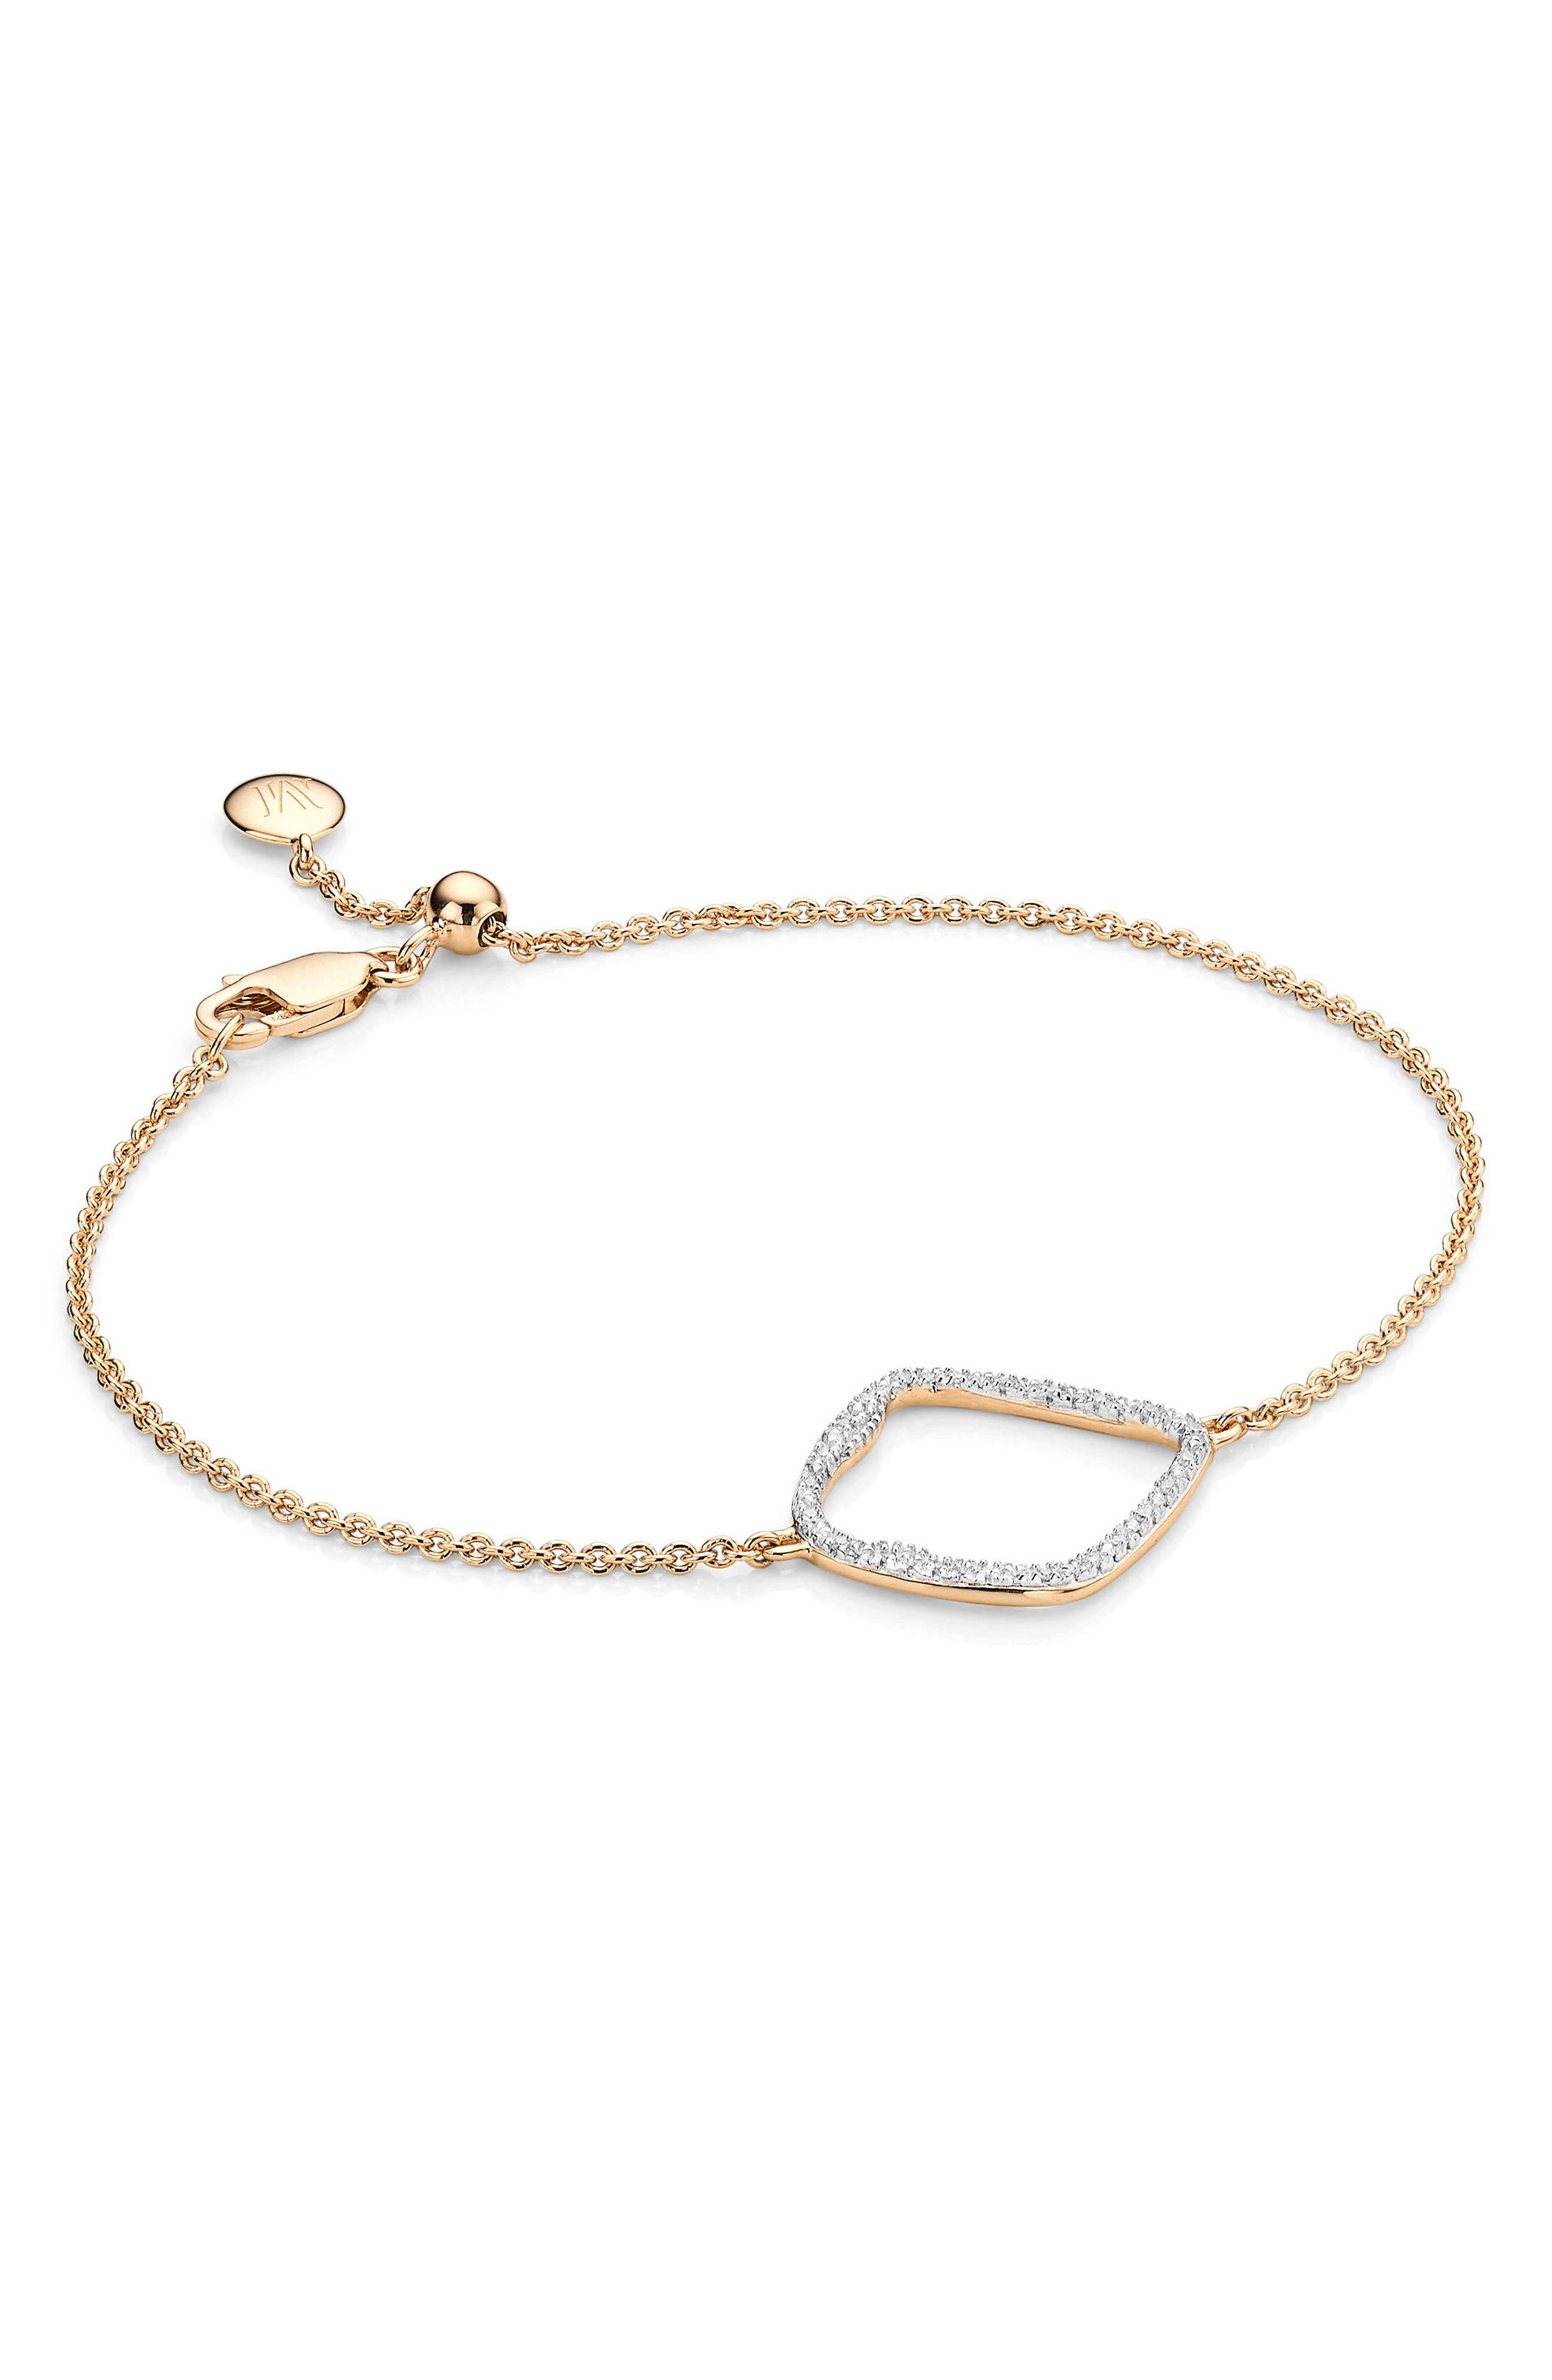 Monica Vinader Riva Large Hoop Diamond Bracelet